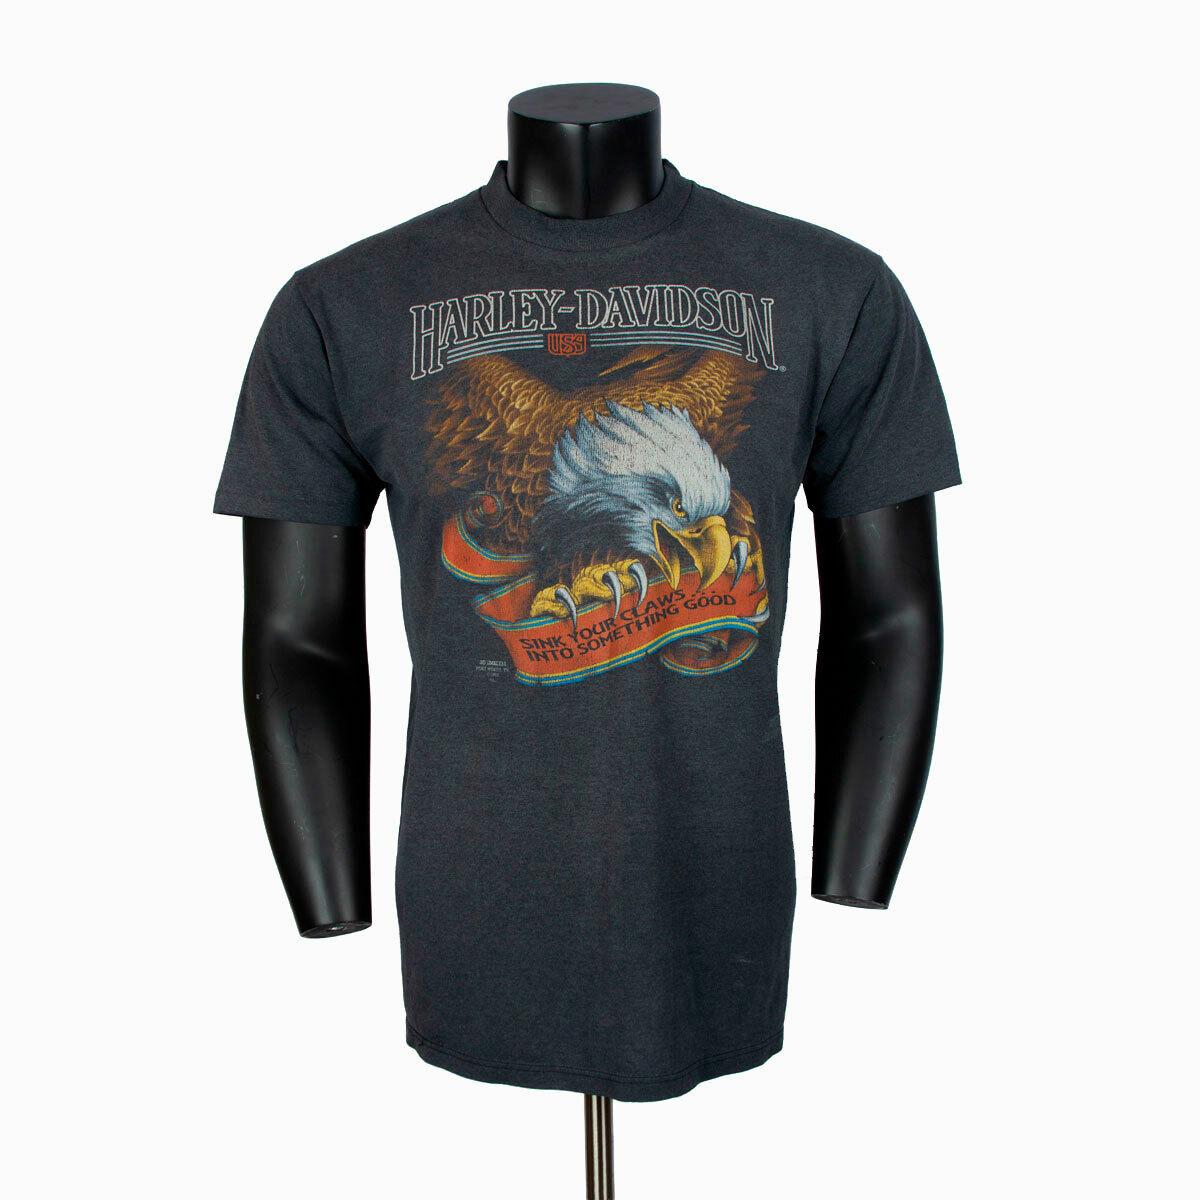 Harley Davidson 3d Emblem shirt eagle sink your claws 1991 XL